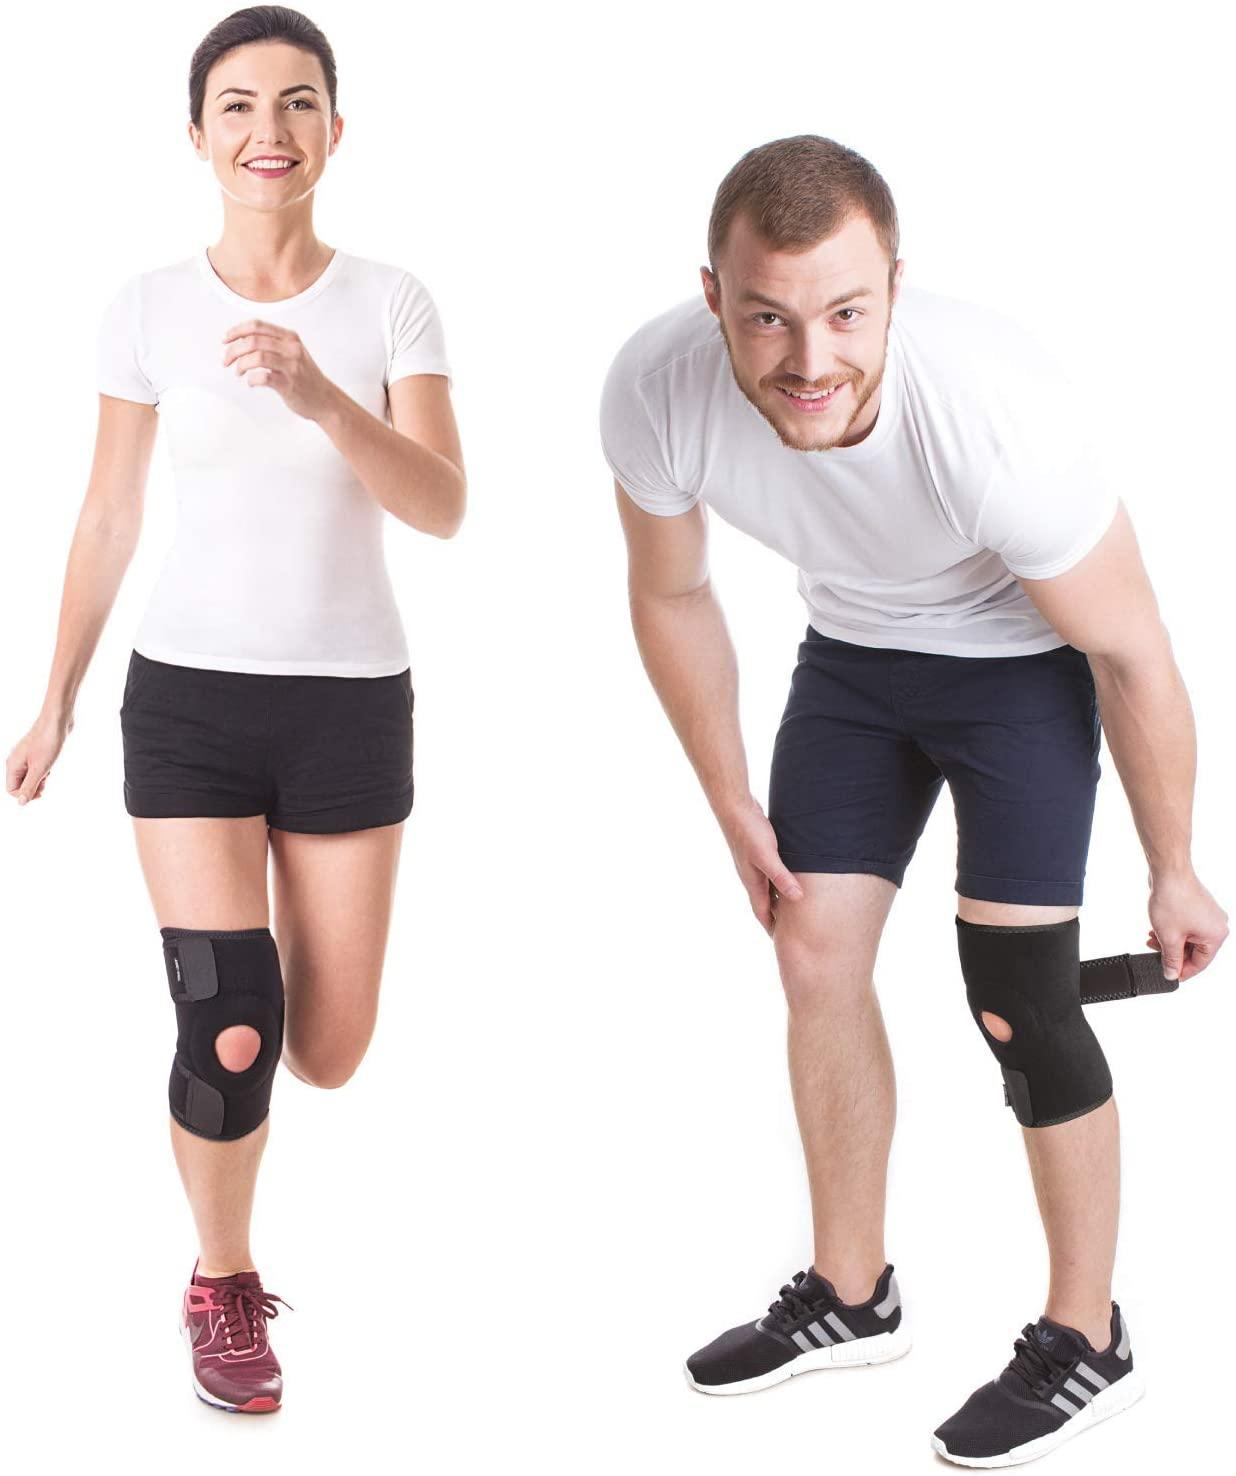 Neoprene Knee Brace Adjustable Stabilizer Comfortable Compression Release Pain Meniscus Arthritis 360° Protection Non-Slip Stretchable Easy Fixation Open Pattella Men Women Medium